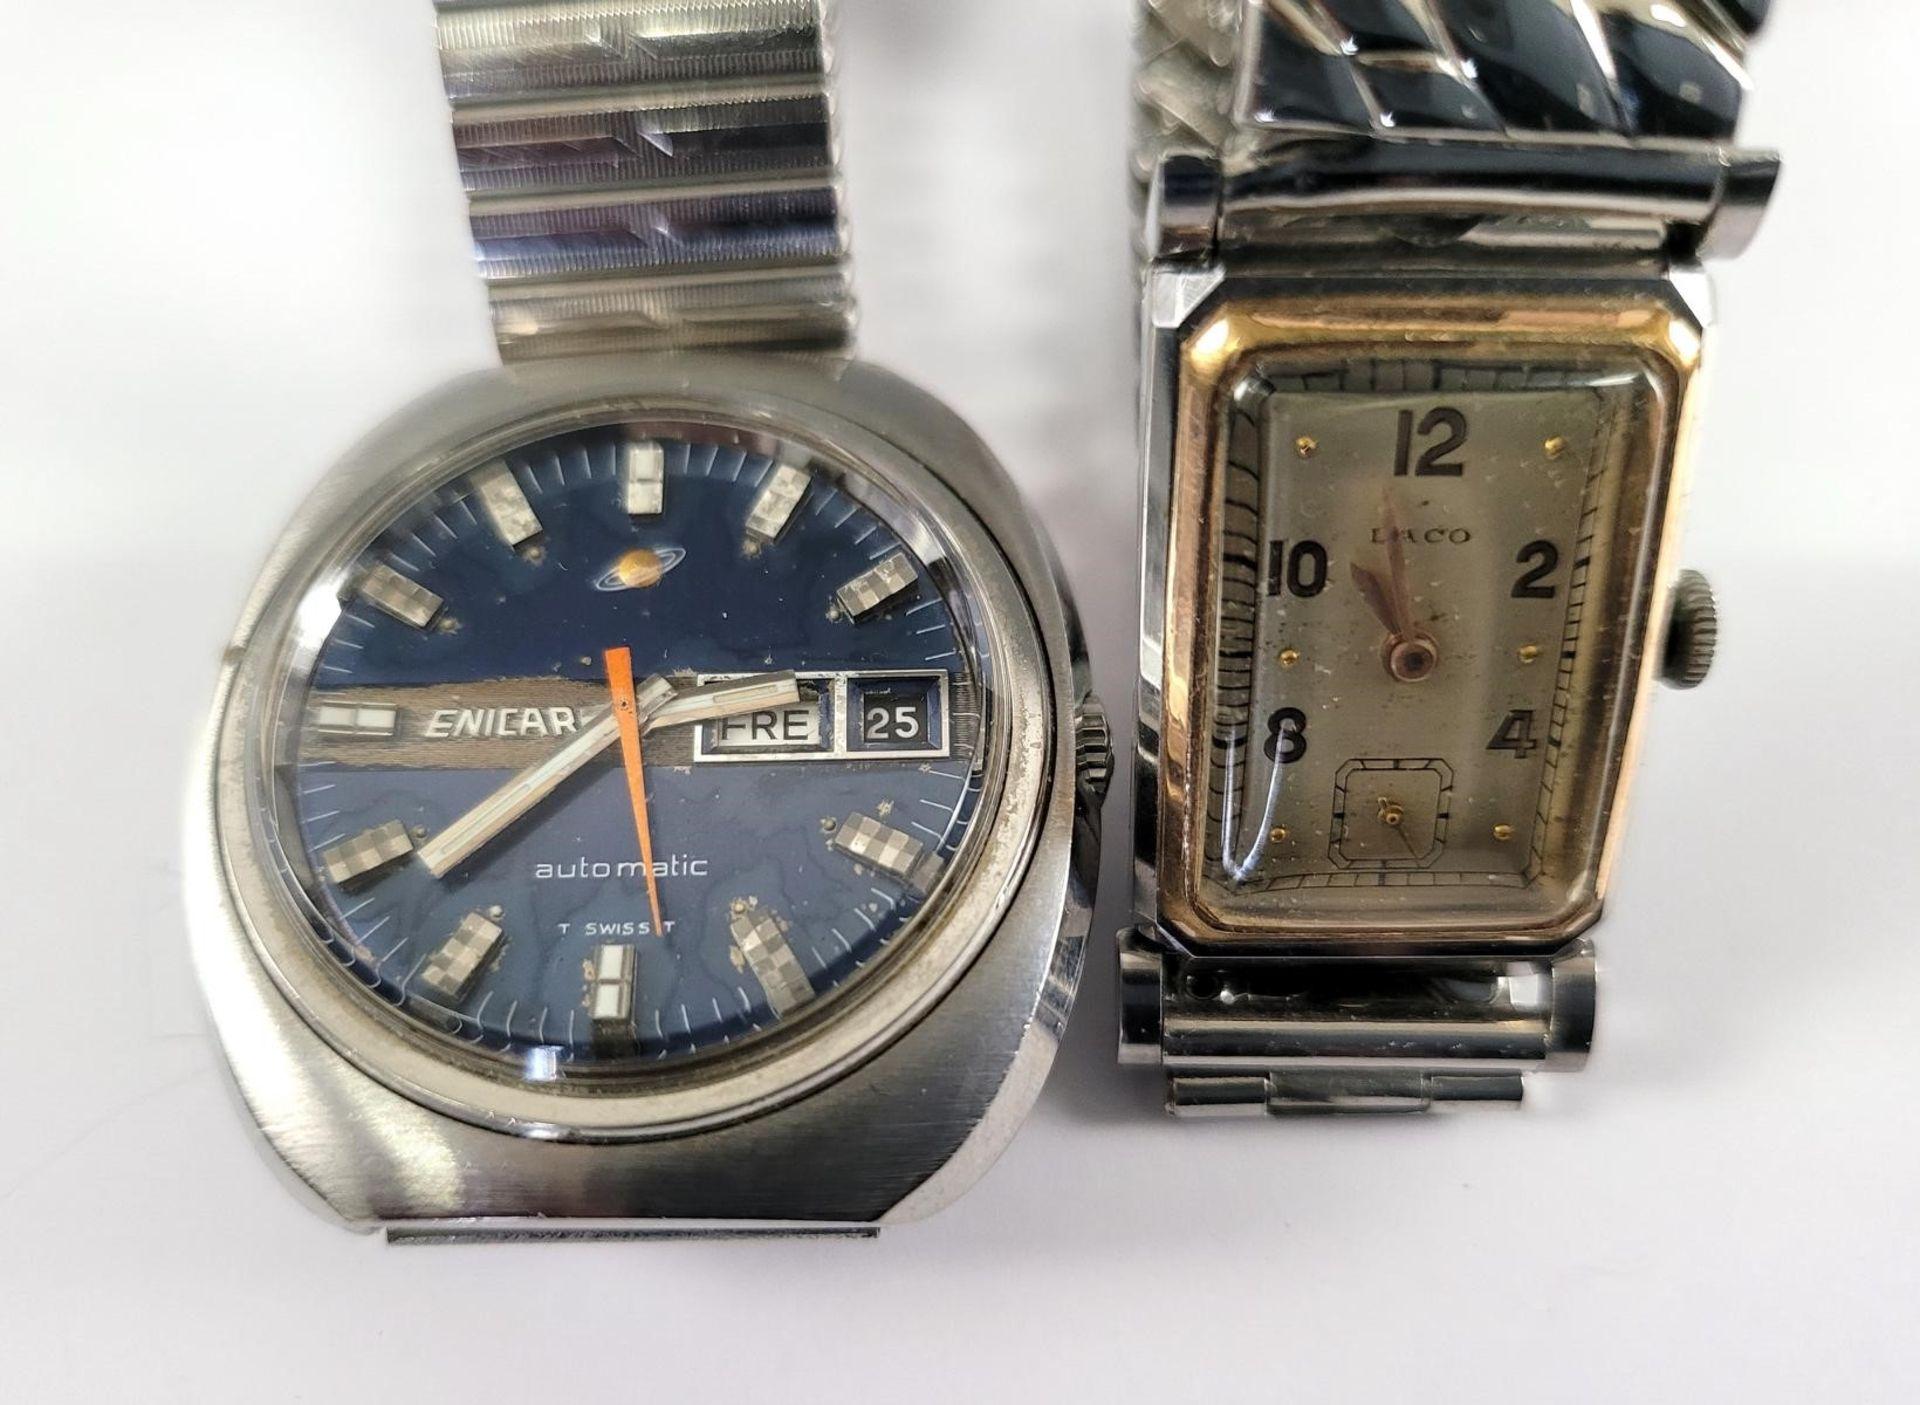 ENICAR Automatic Herrenarmbanduhr und LACO Damenarmbanduhr